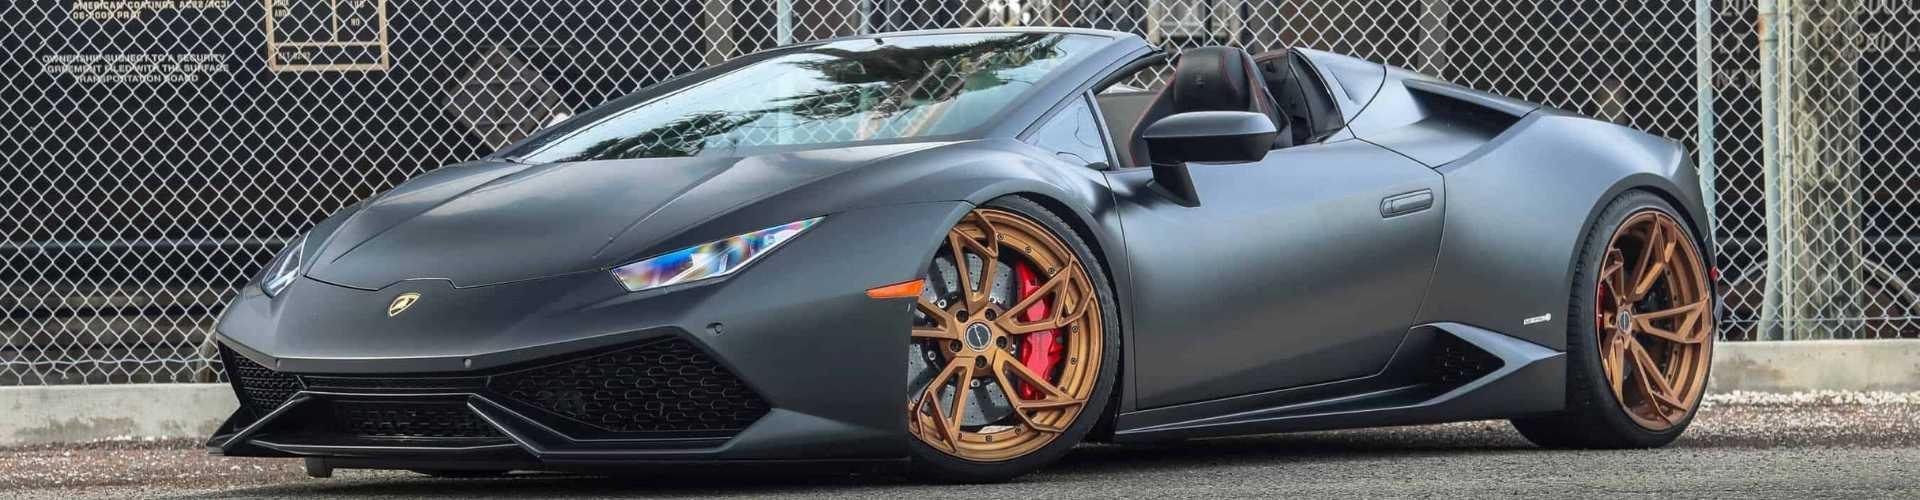 Bronze Alloy Wheels